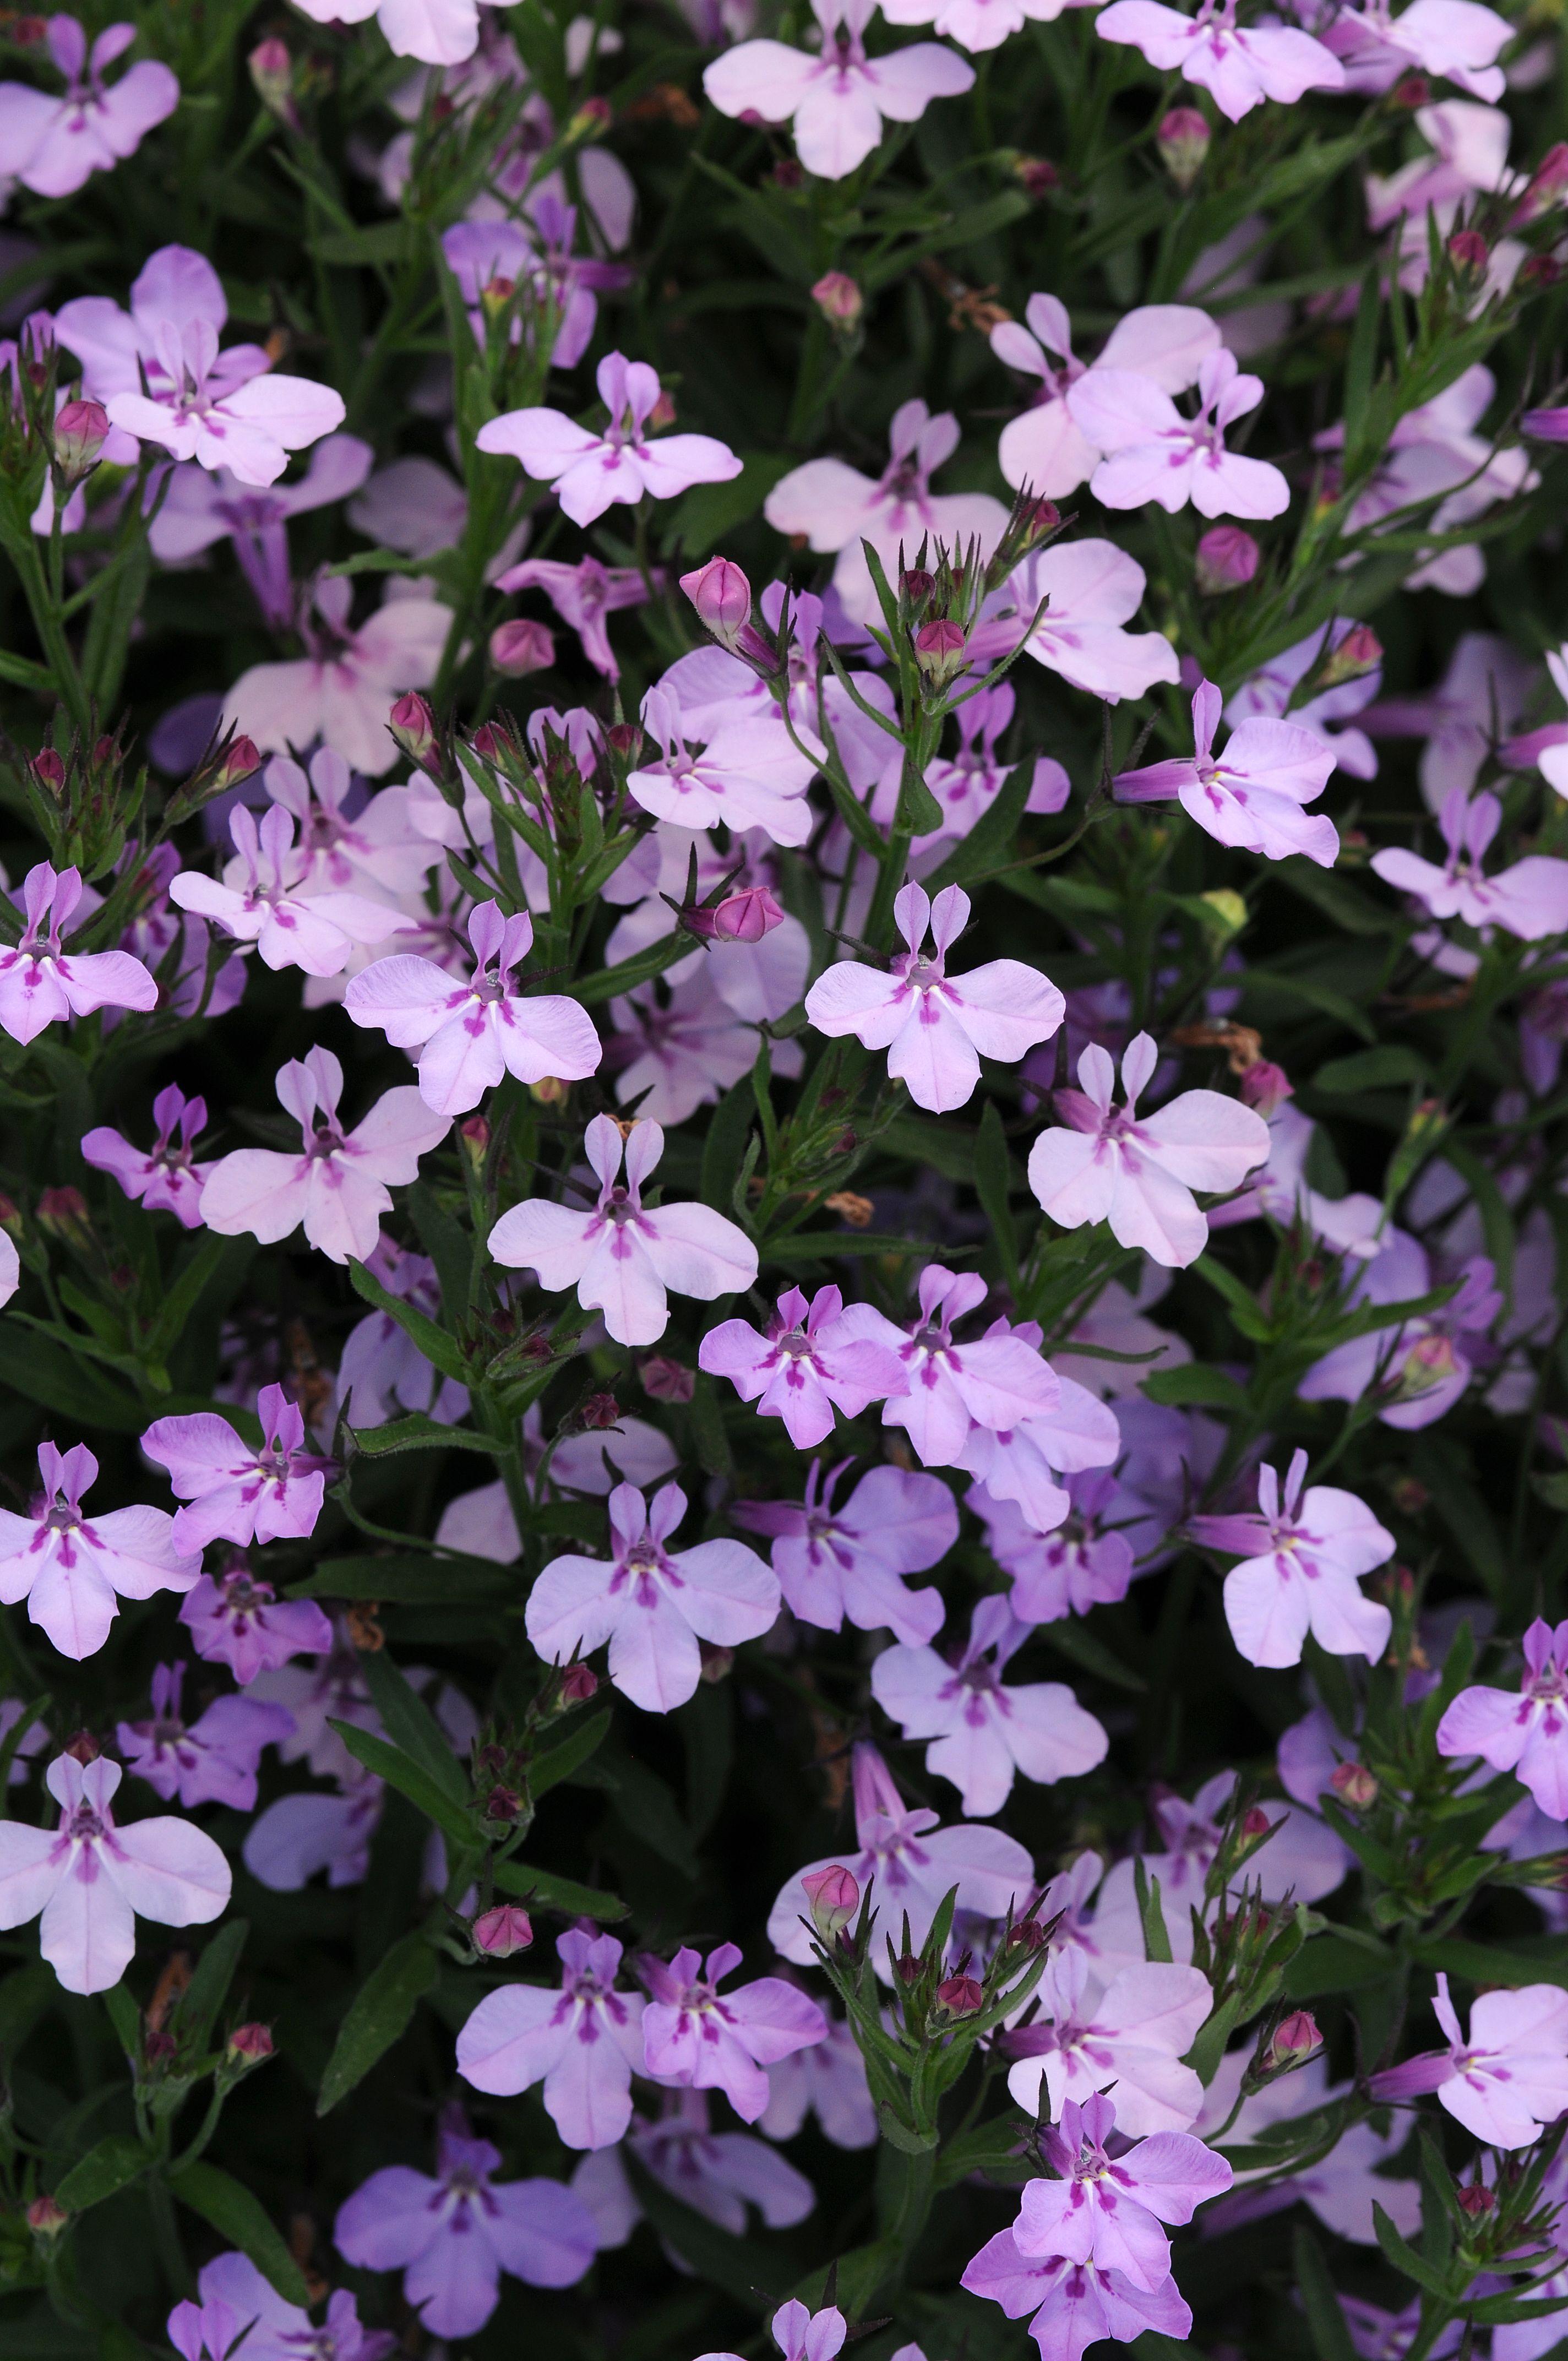 Lobelia Hot Springs Lavender Pink Ball Horticultural Co Spring